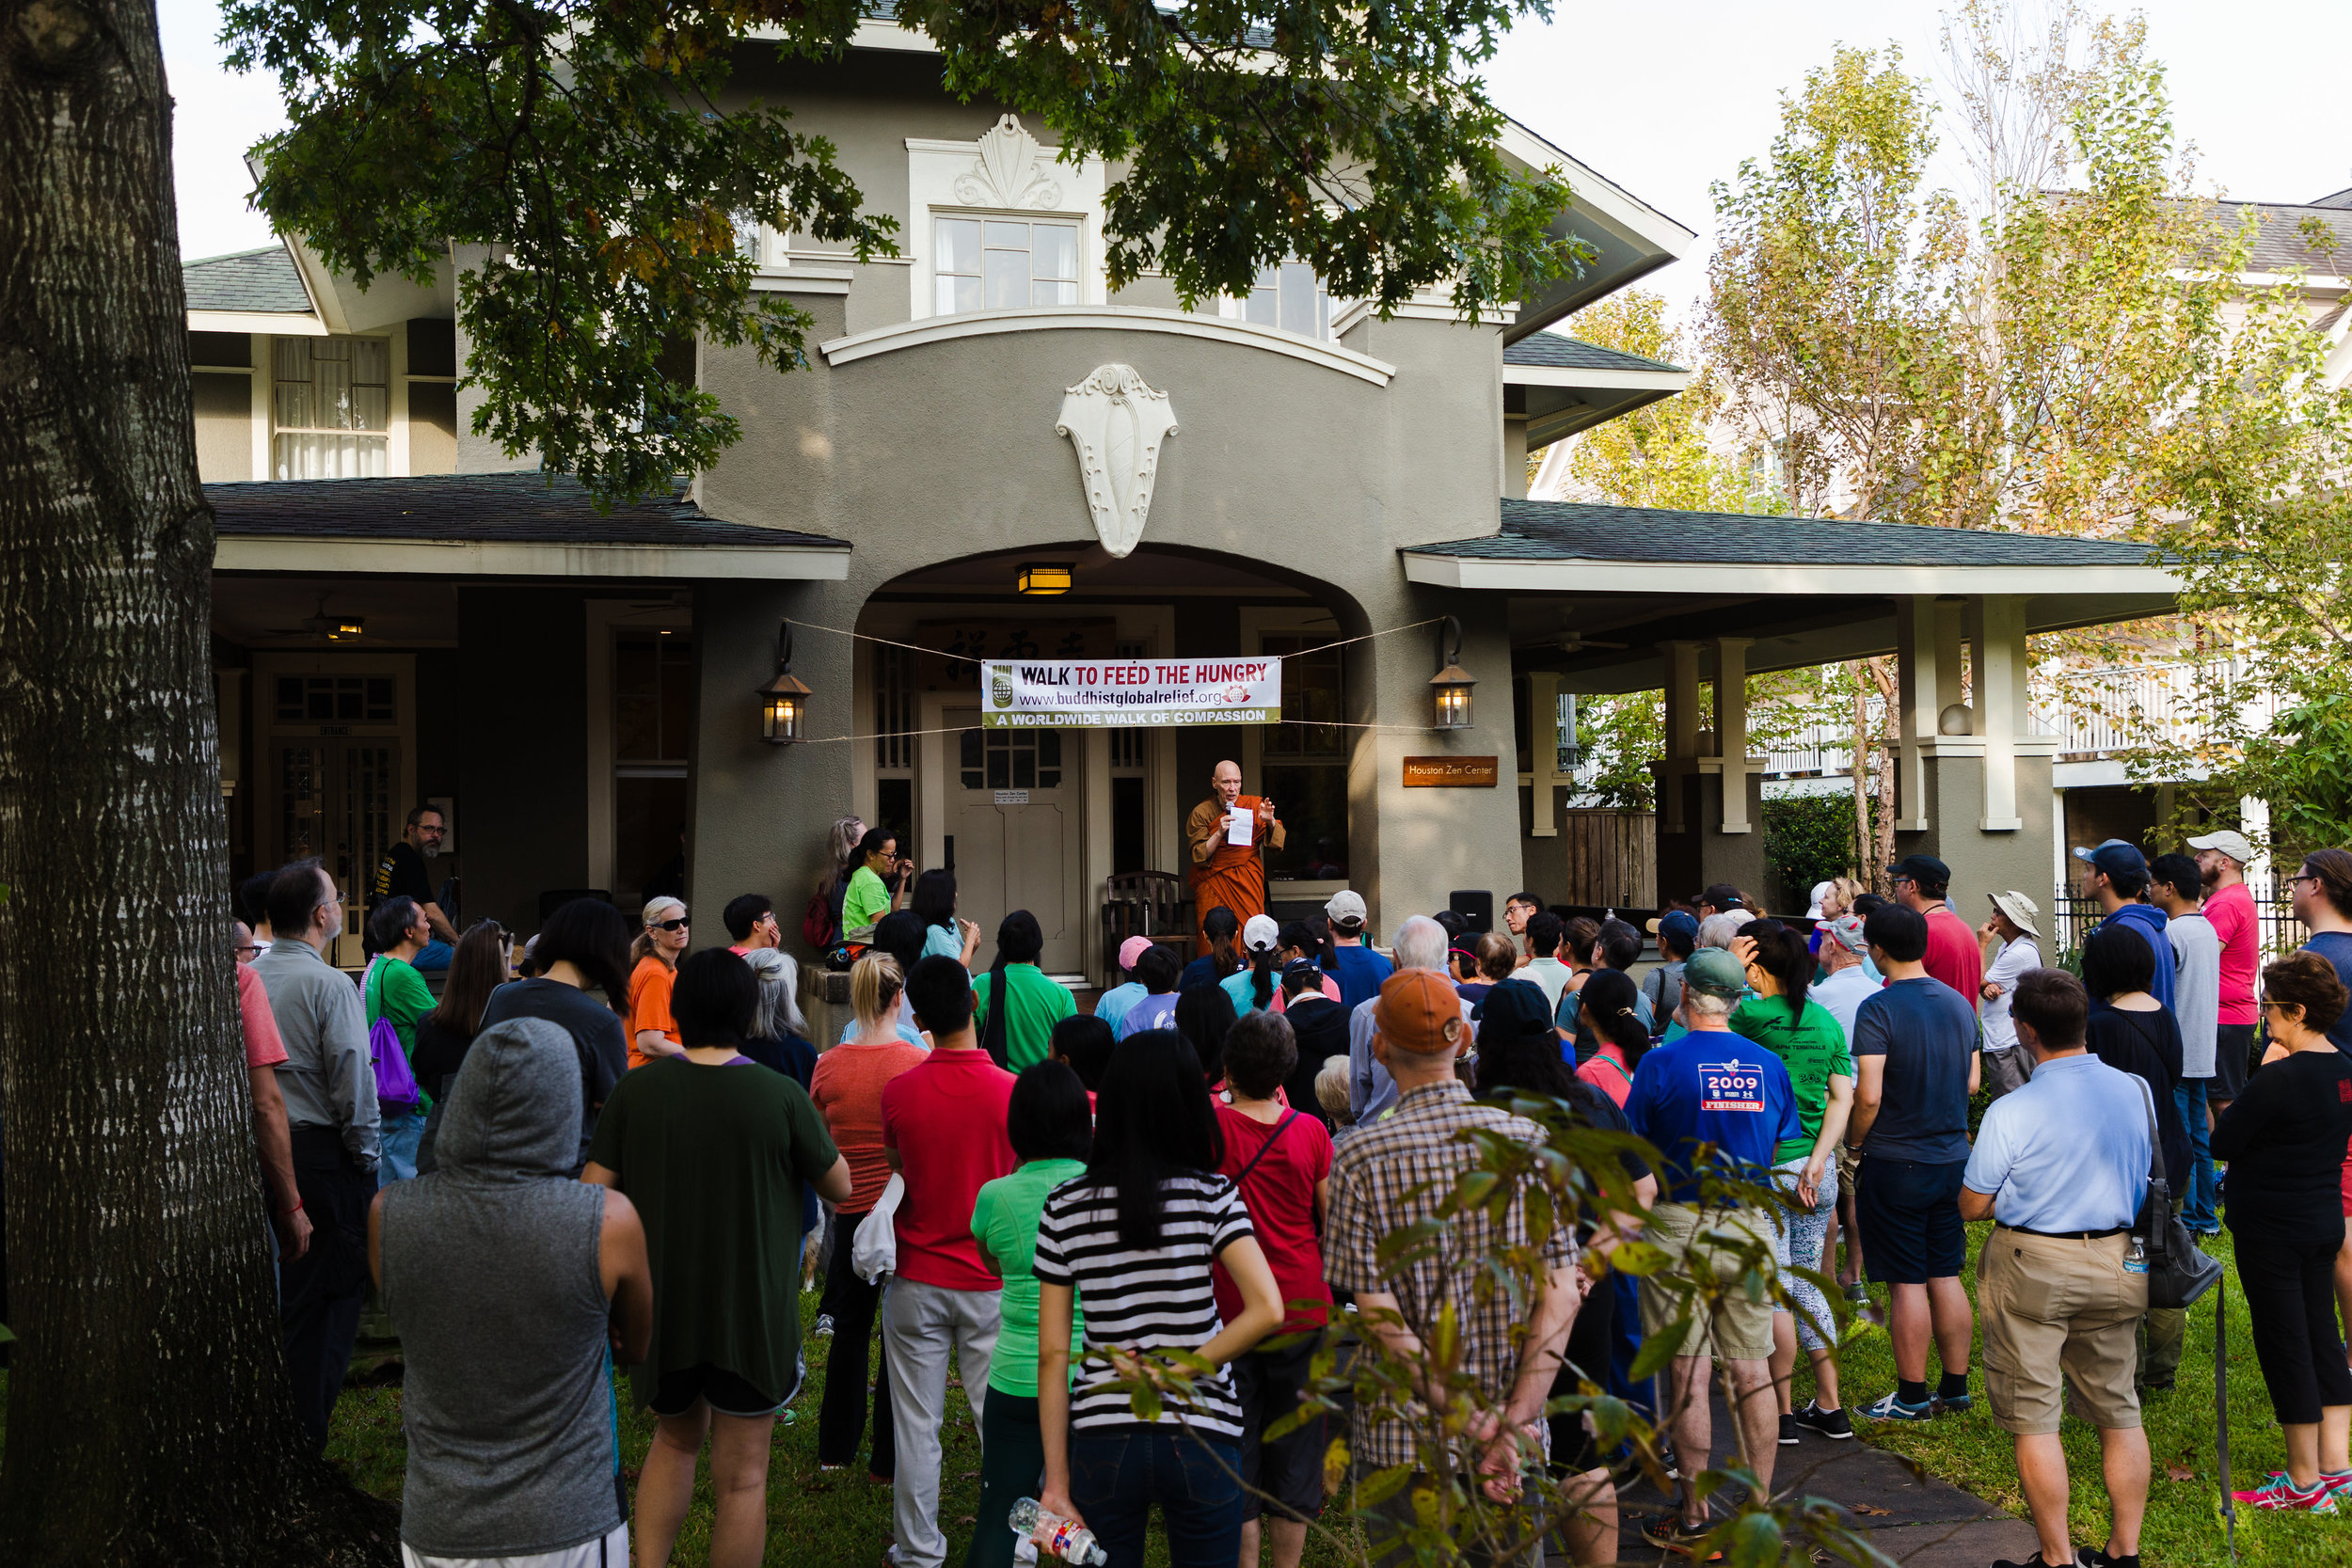 Bhikkhu-Bodhi-Global-Relief-Houston-Zen-Walk-38.jpg